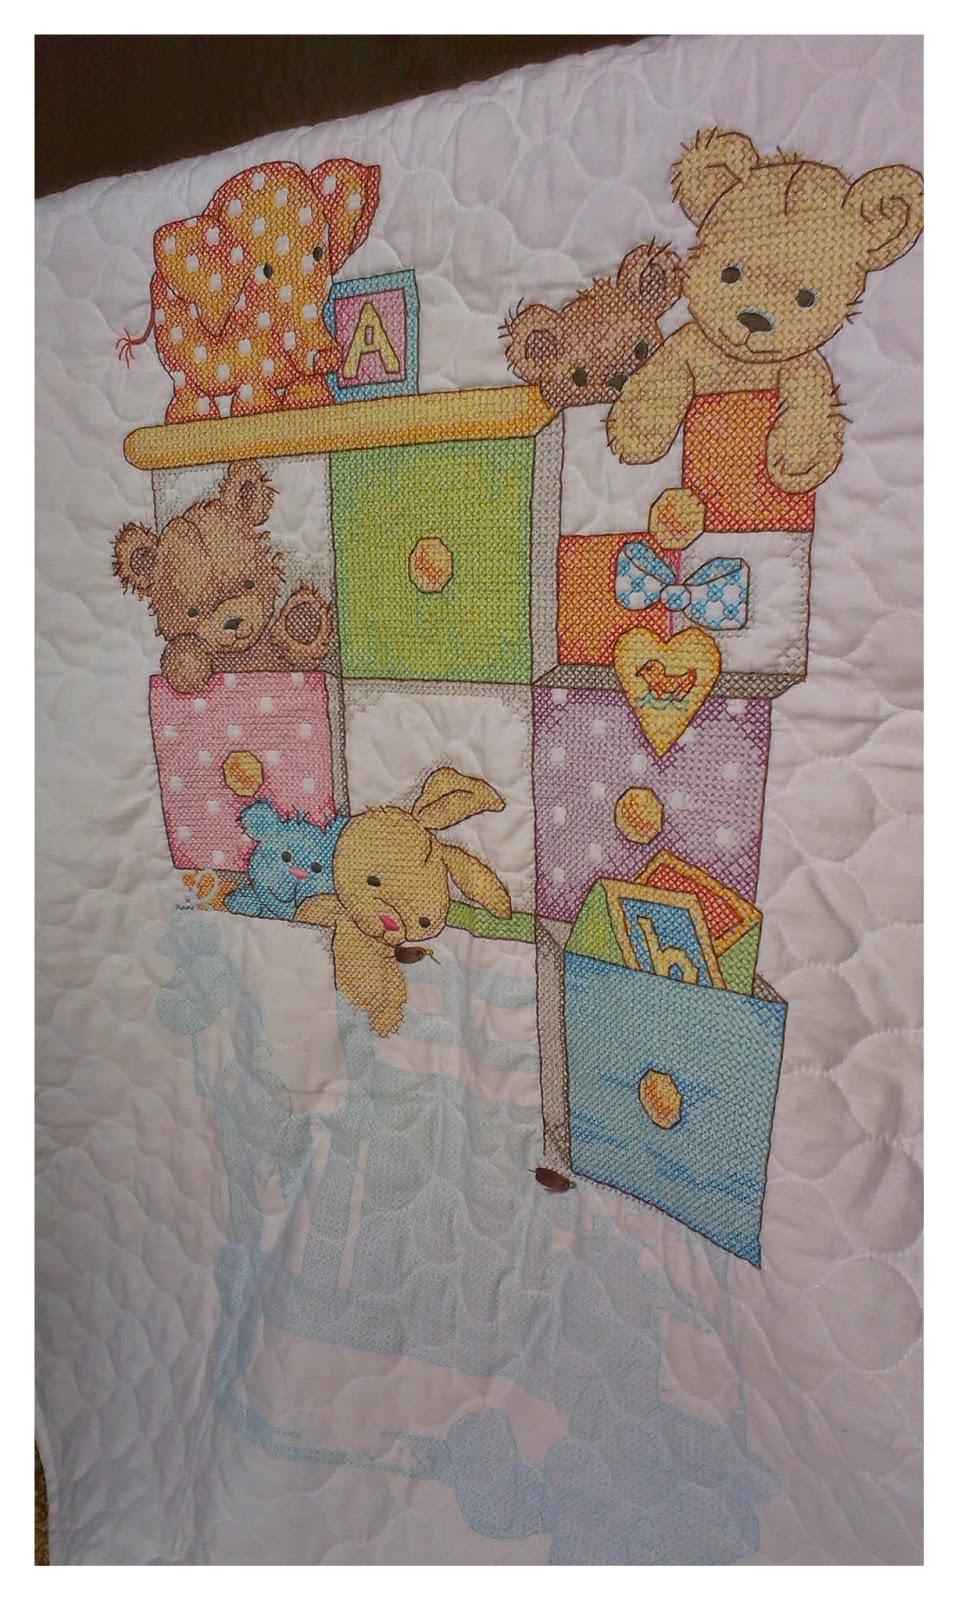 Детские вещички, процесс Dimensions 73537, одеяло от Dimensions